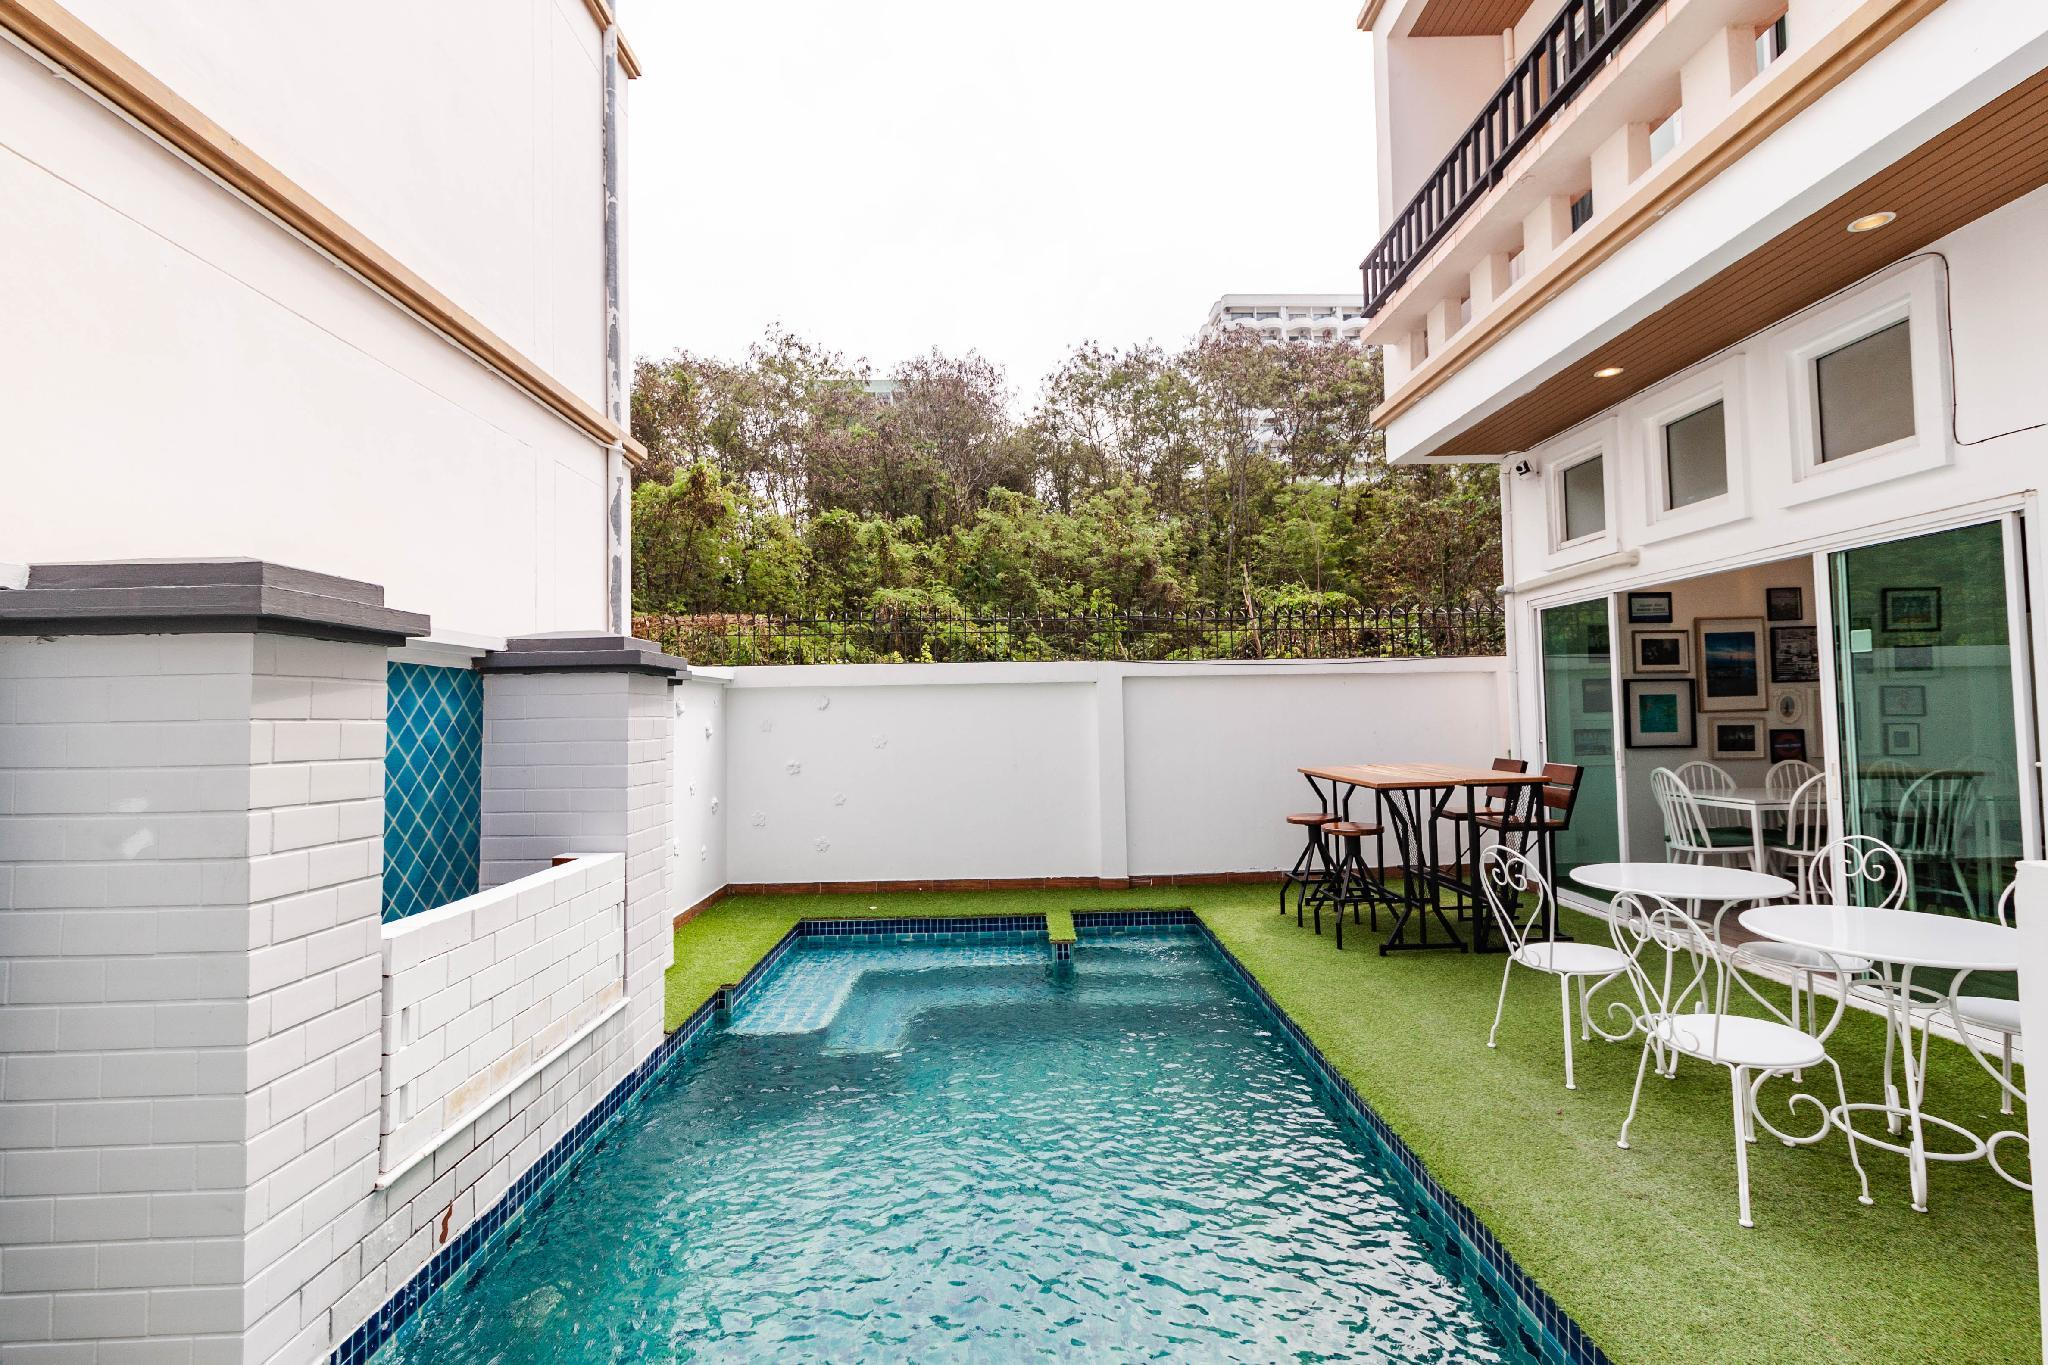 4 Bedrooms Pool Villa 2 KM Walking Street